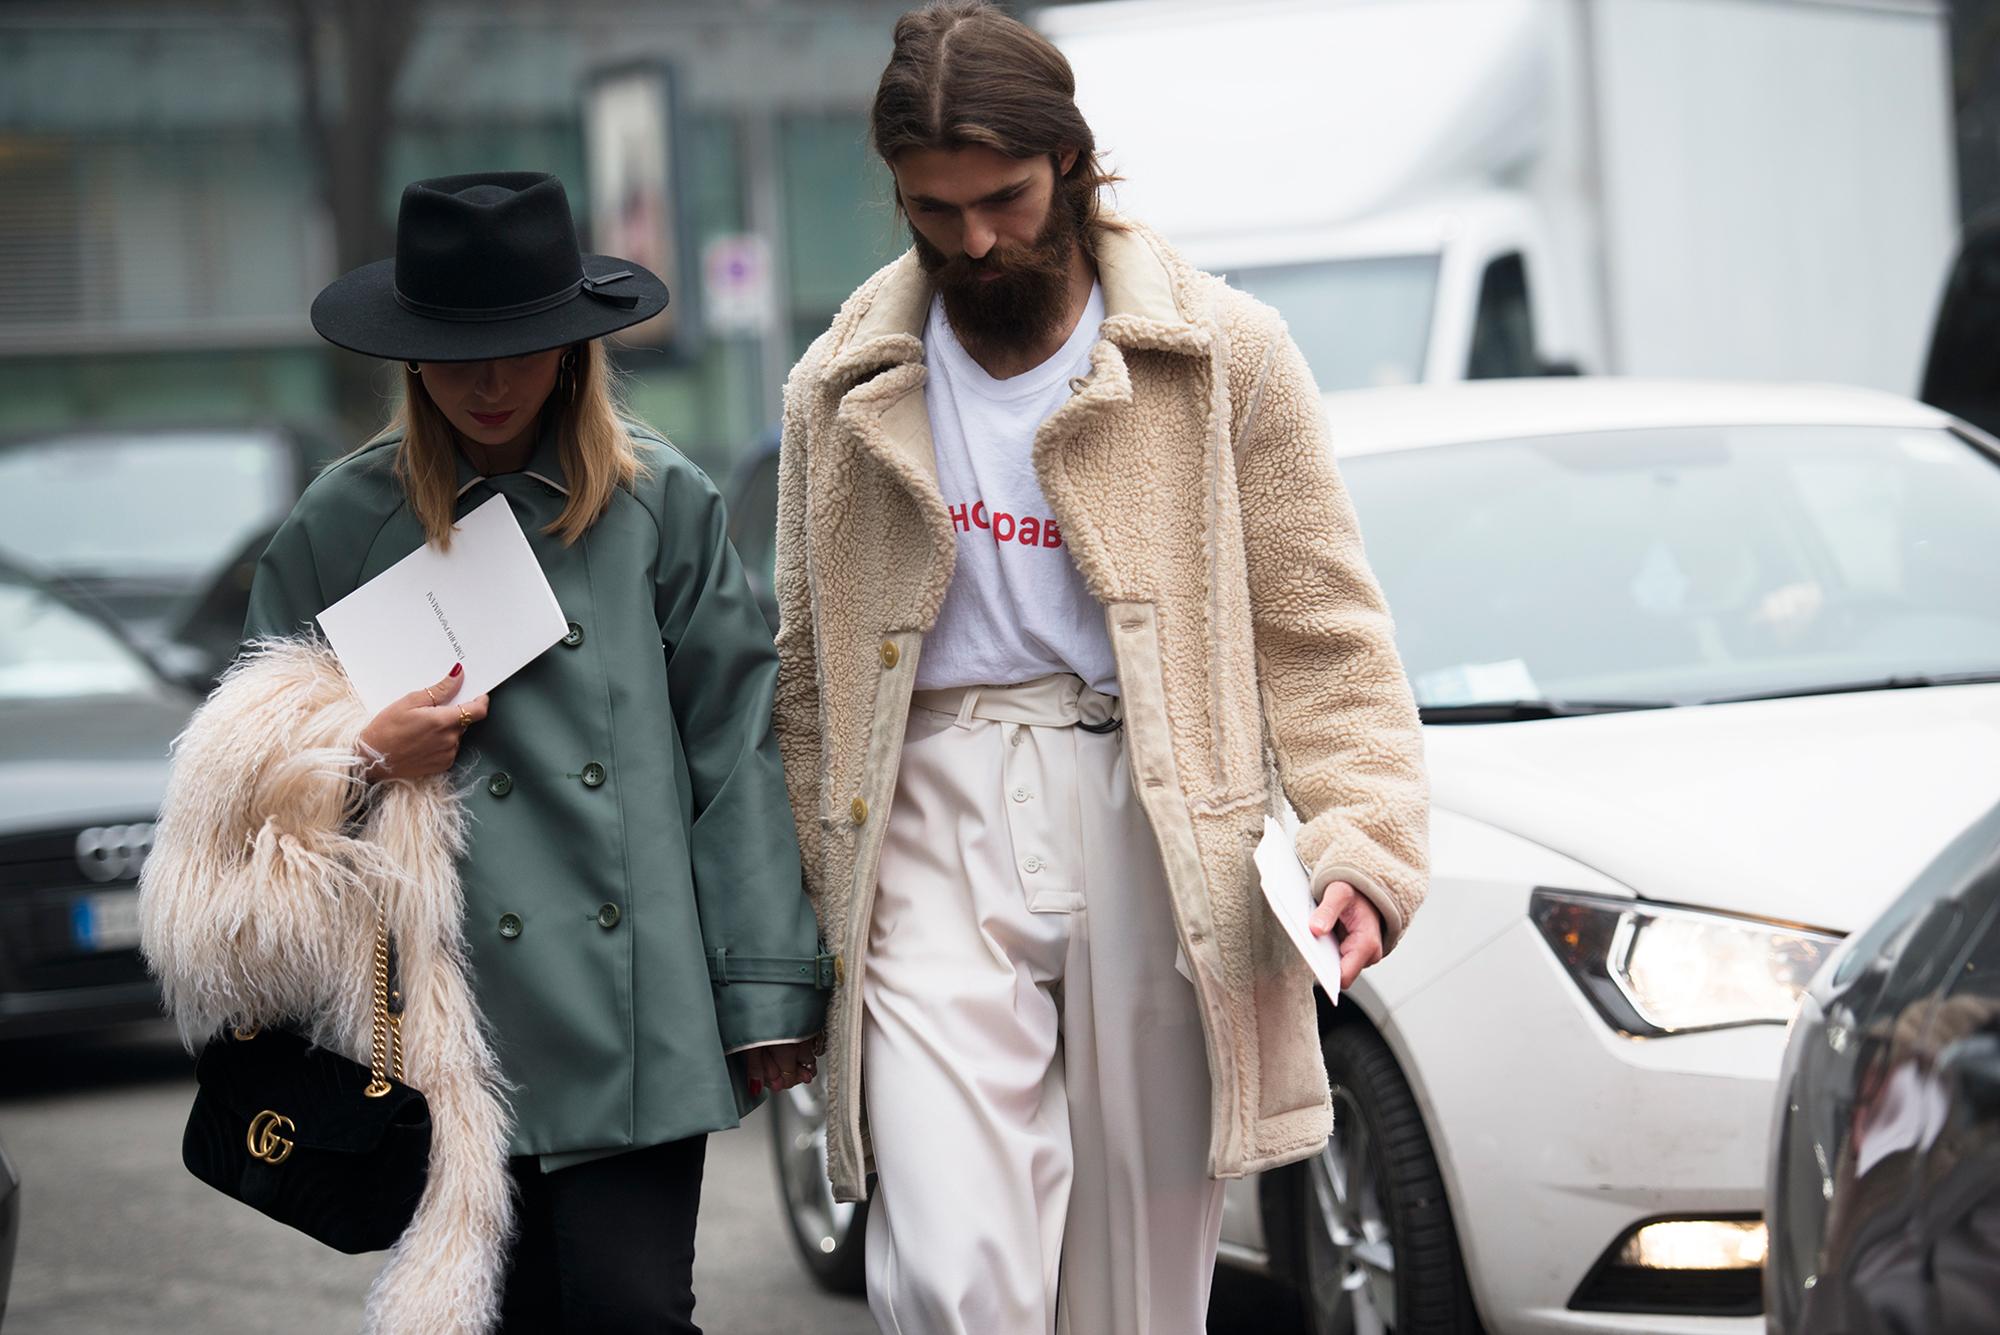 Streetsnaps Milan Fashion Week February 2017 - 3739929